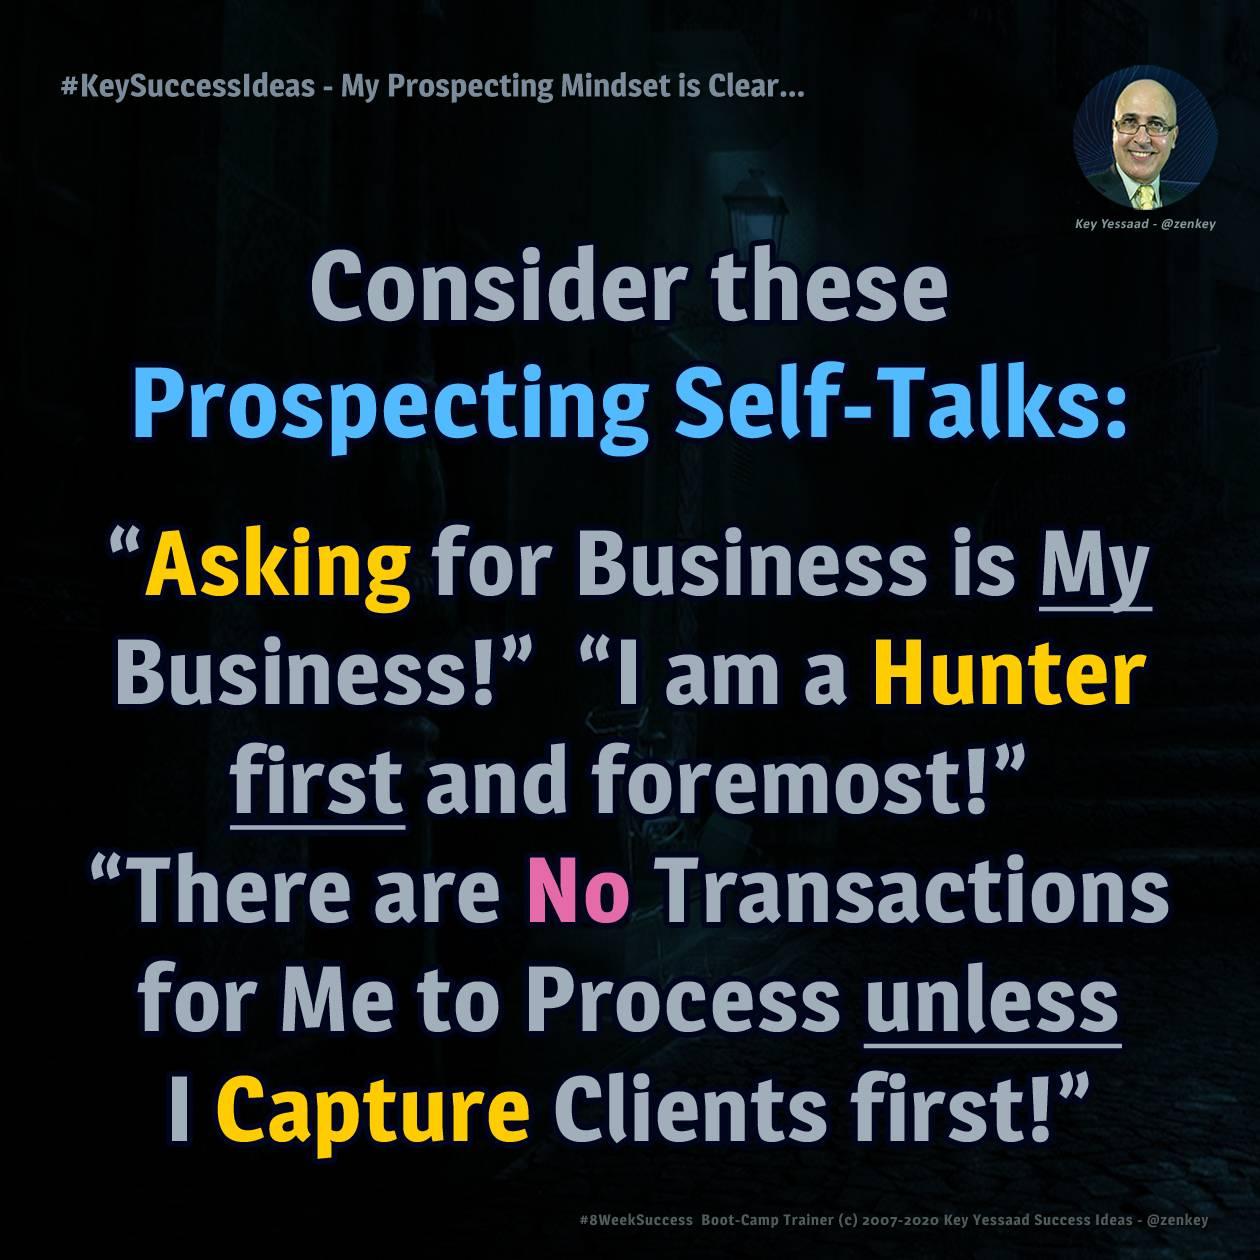 My Prospecting Mindset is Clear... - #KeySuccessIdeas